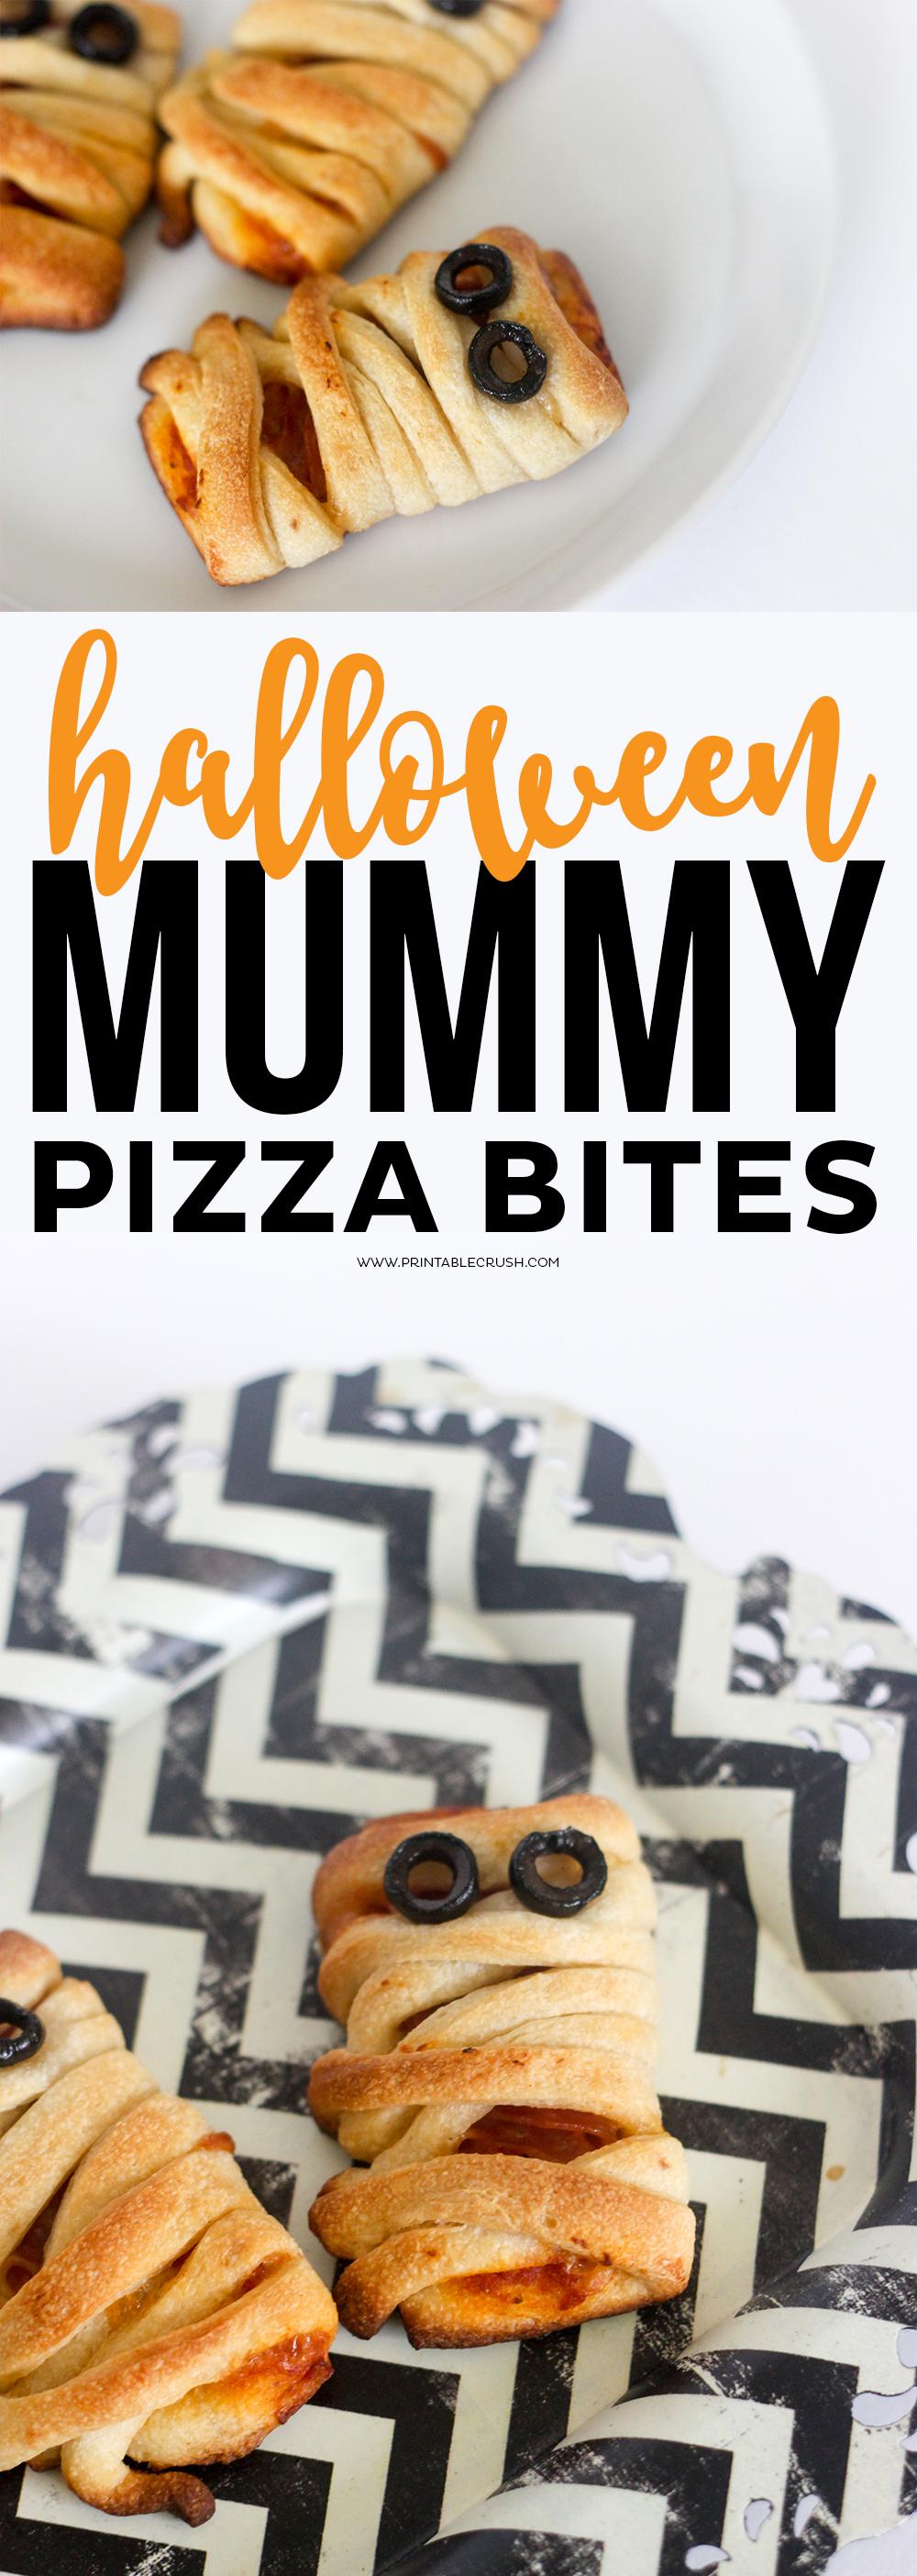 Halloween Mummy Pizza Bites - Printable Crush